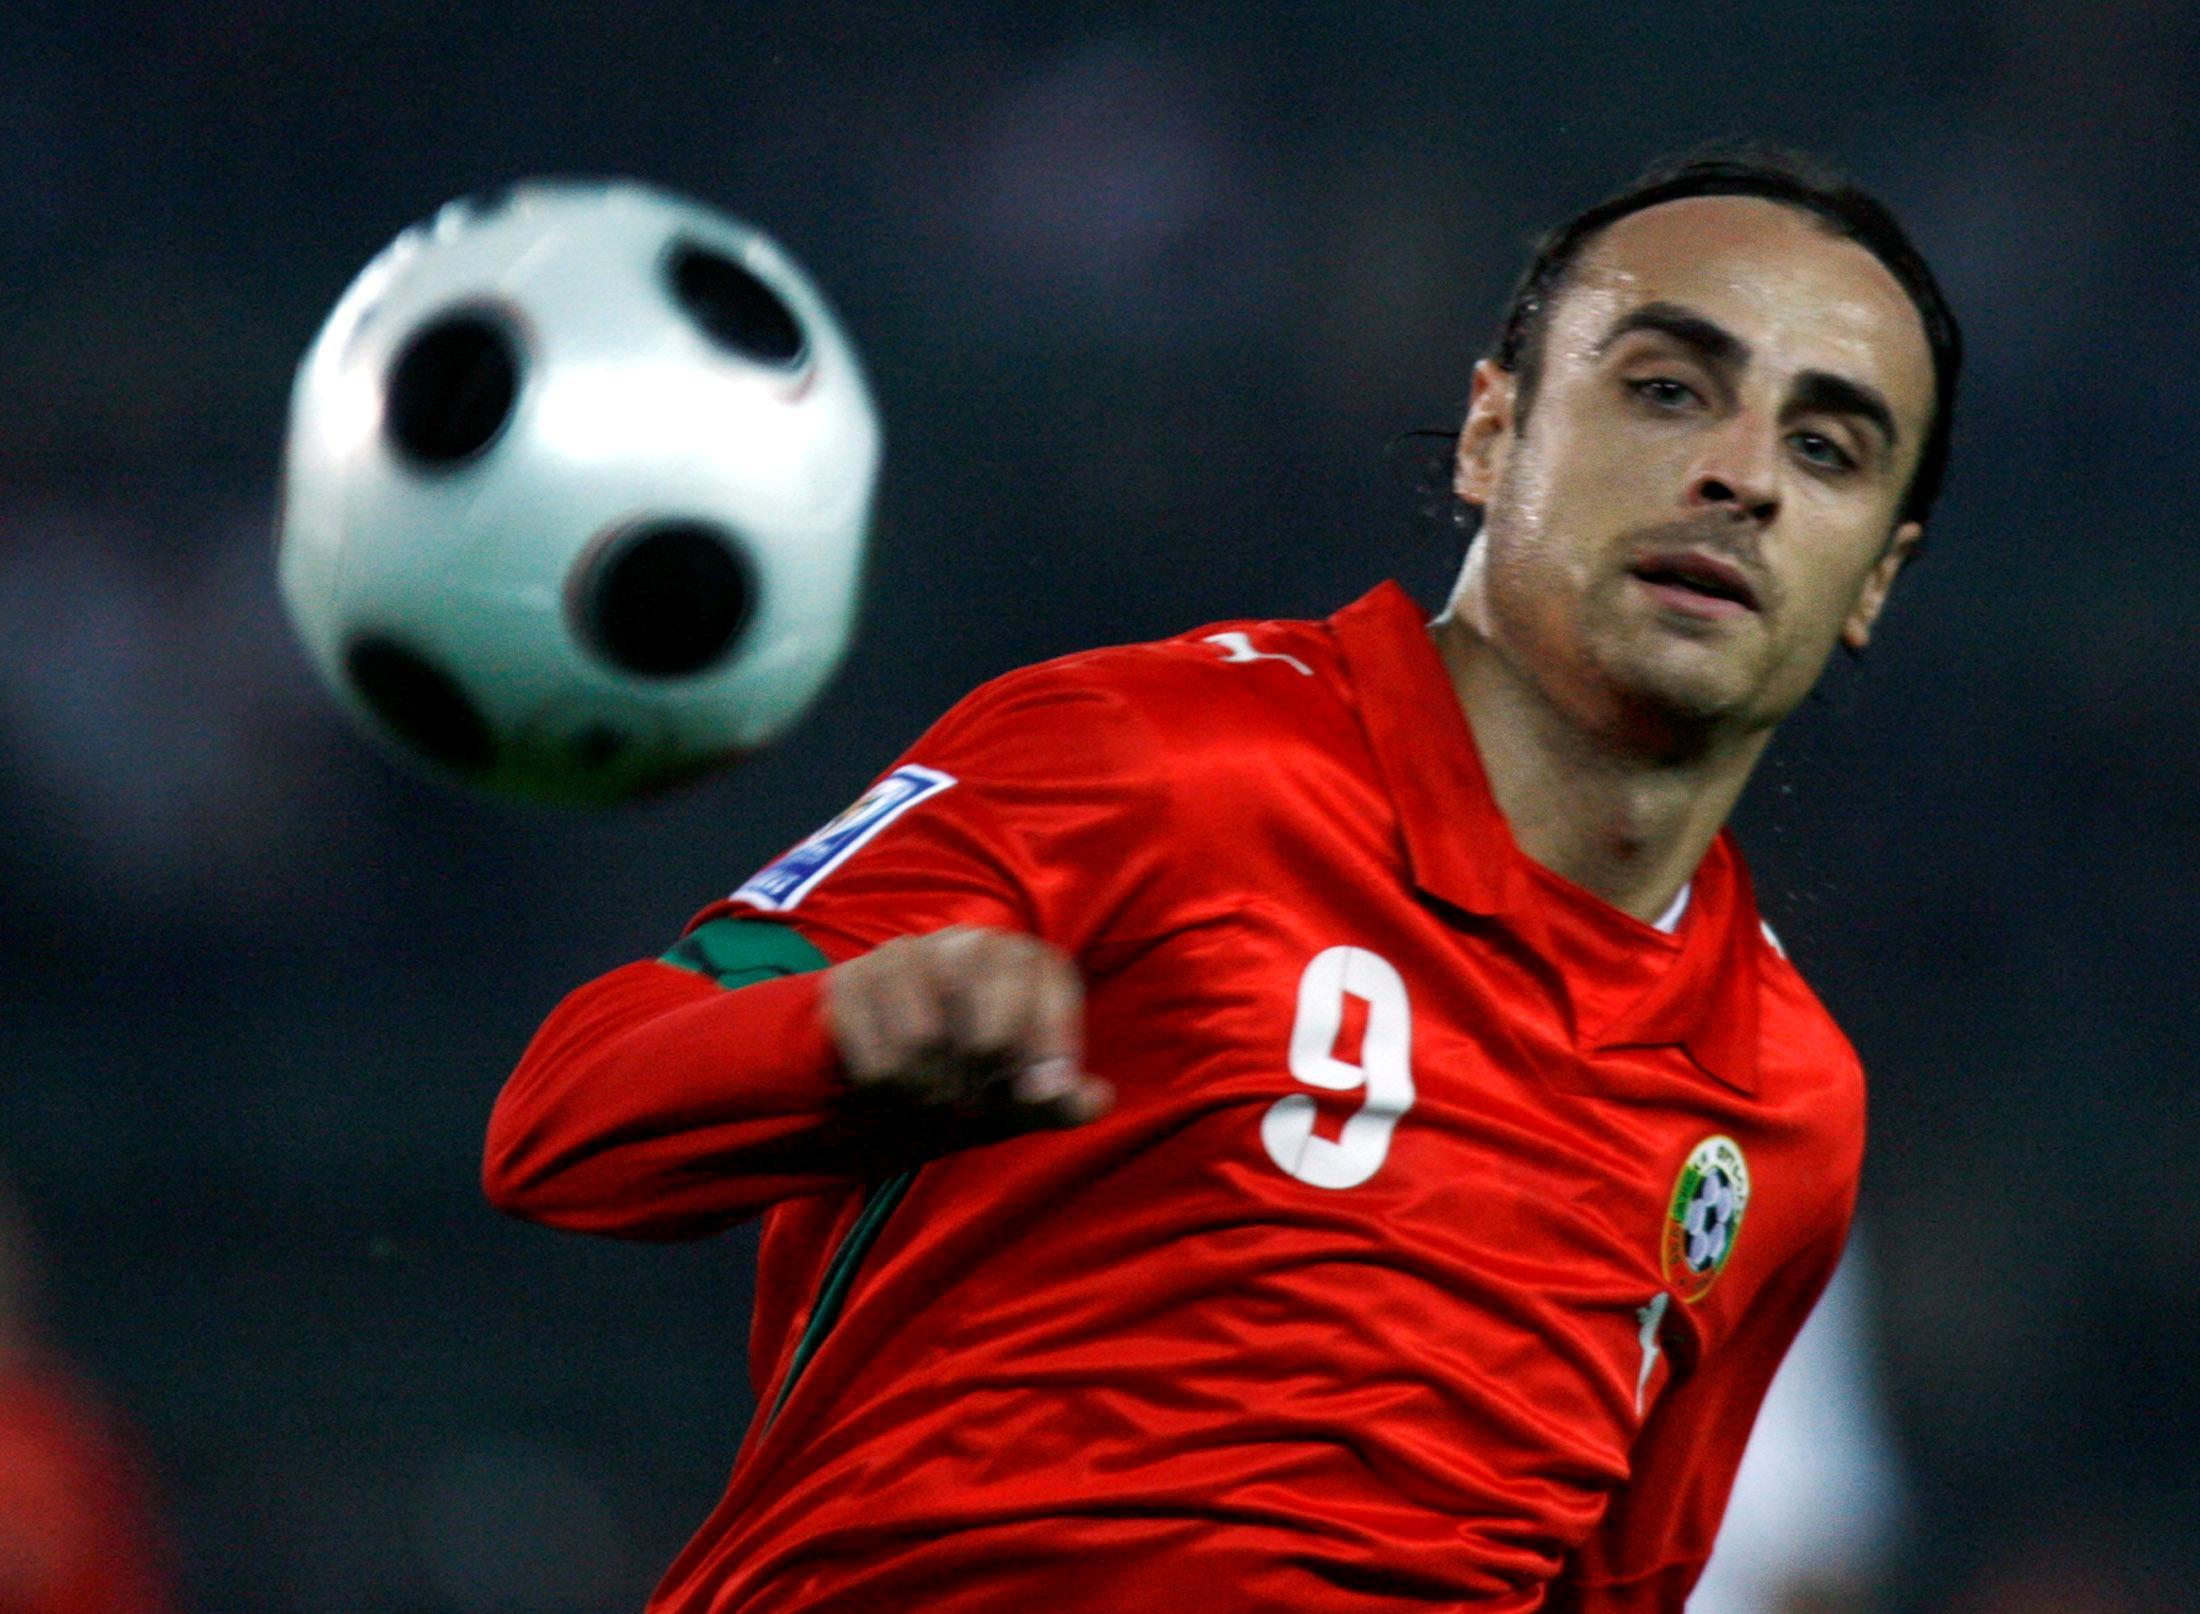 Bulgaria's record goalscorer Berbatov announces retirement